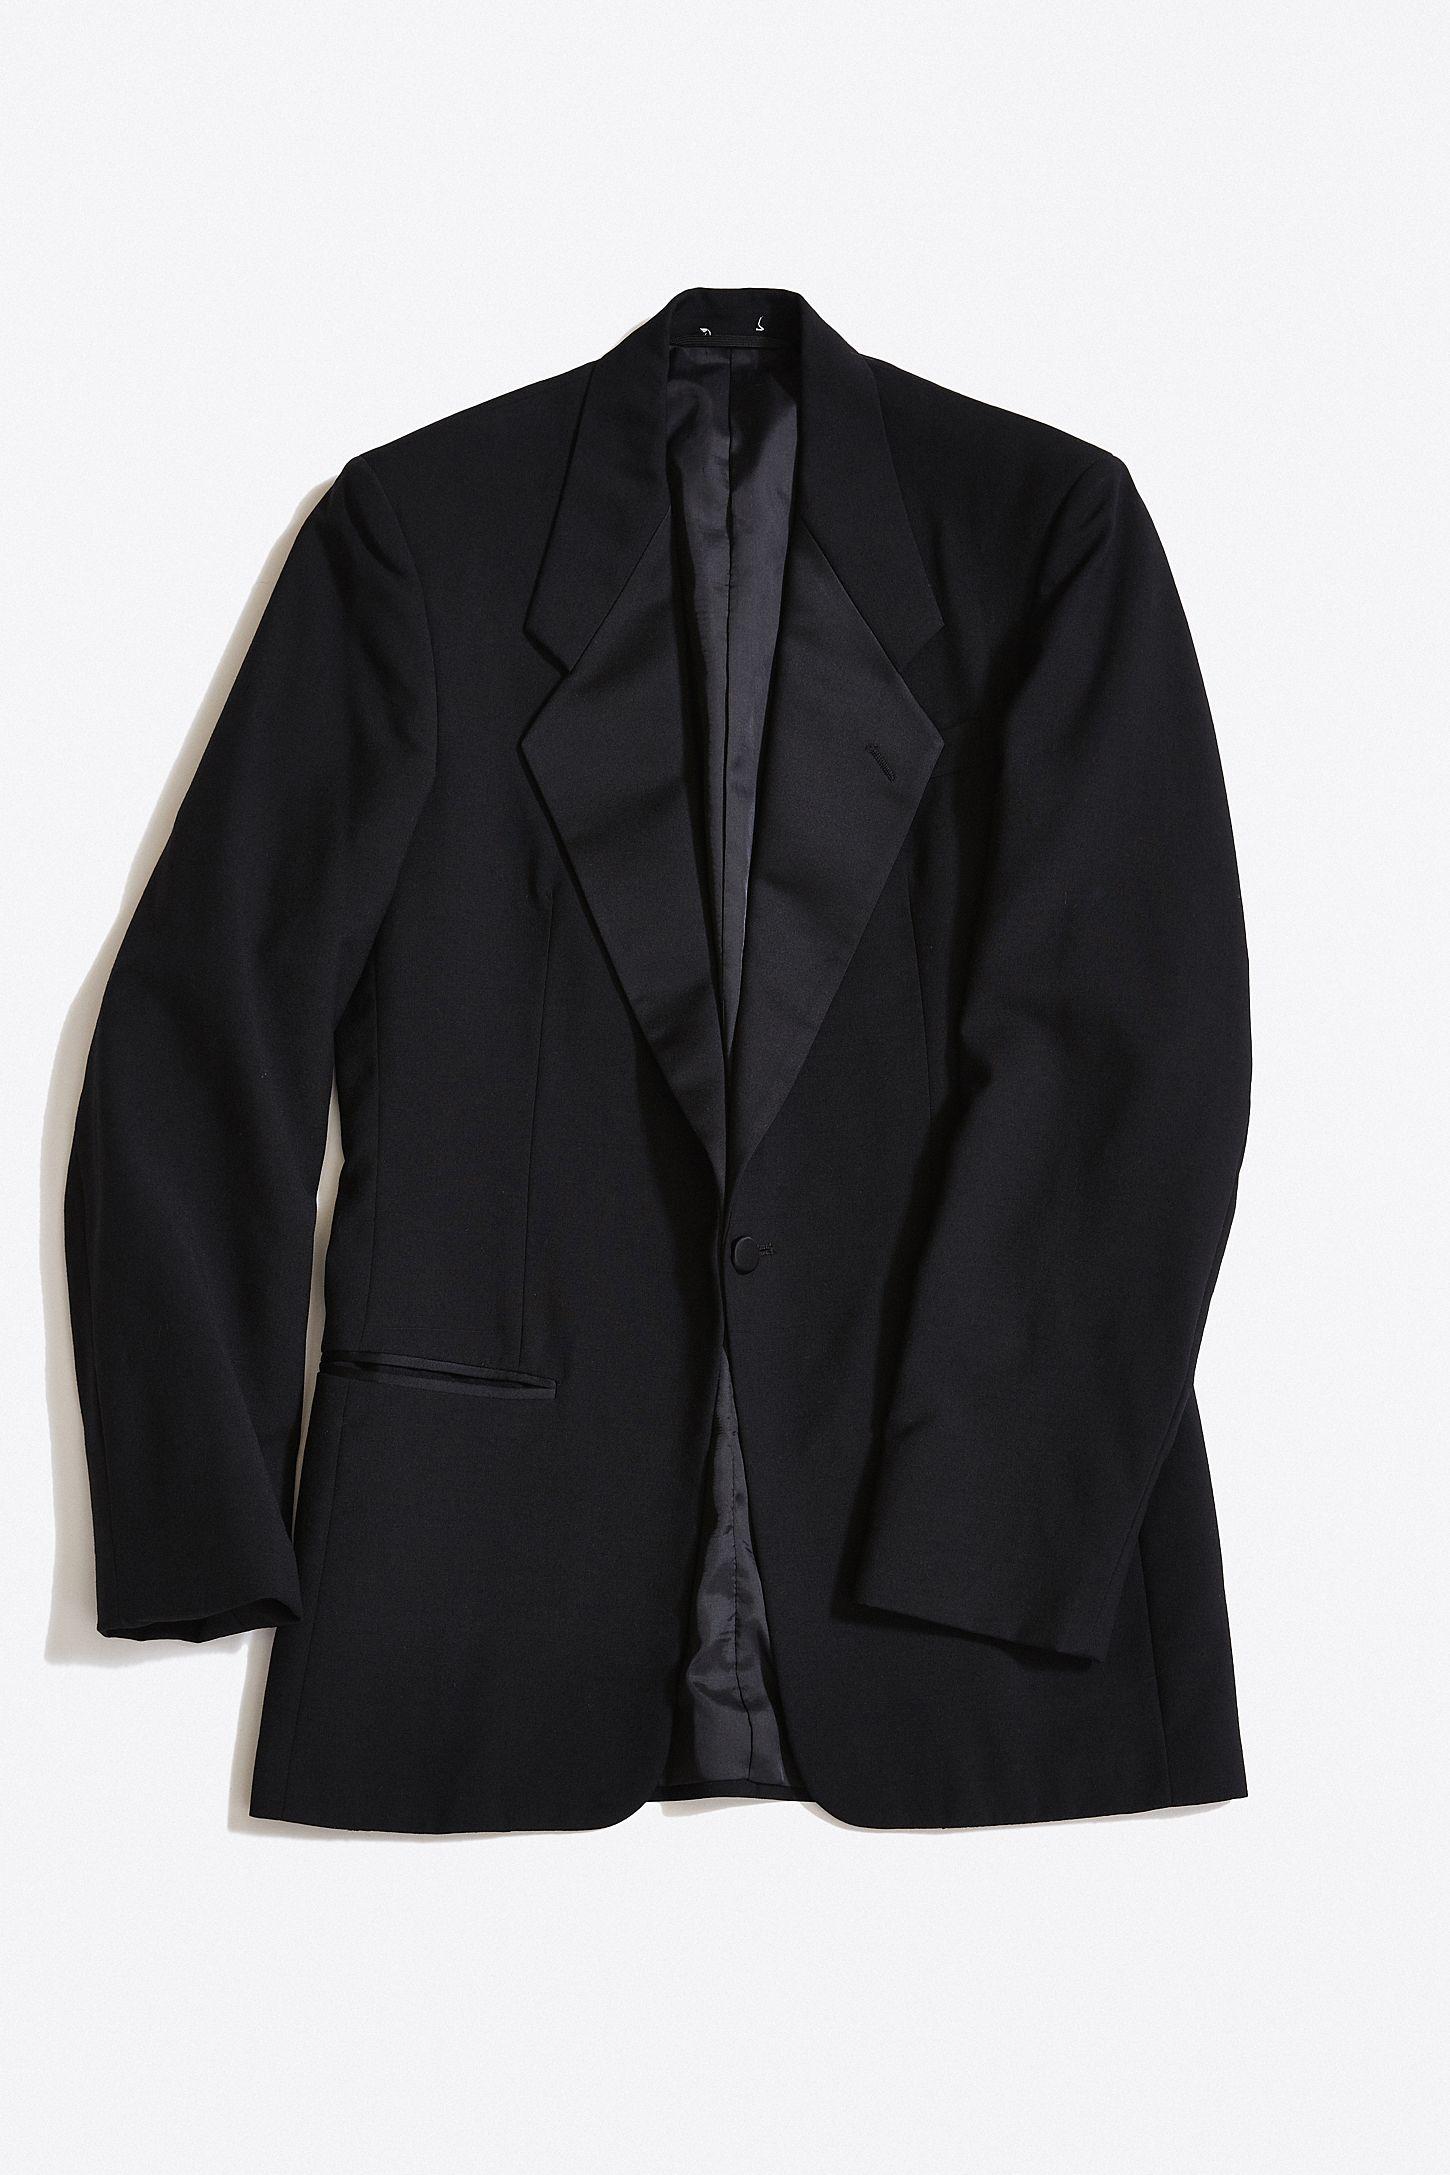 1d248afecb2 Vintage Yves Saint Laurent Tuxedo Jacket | Urban Outfitters